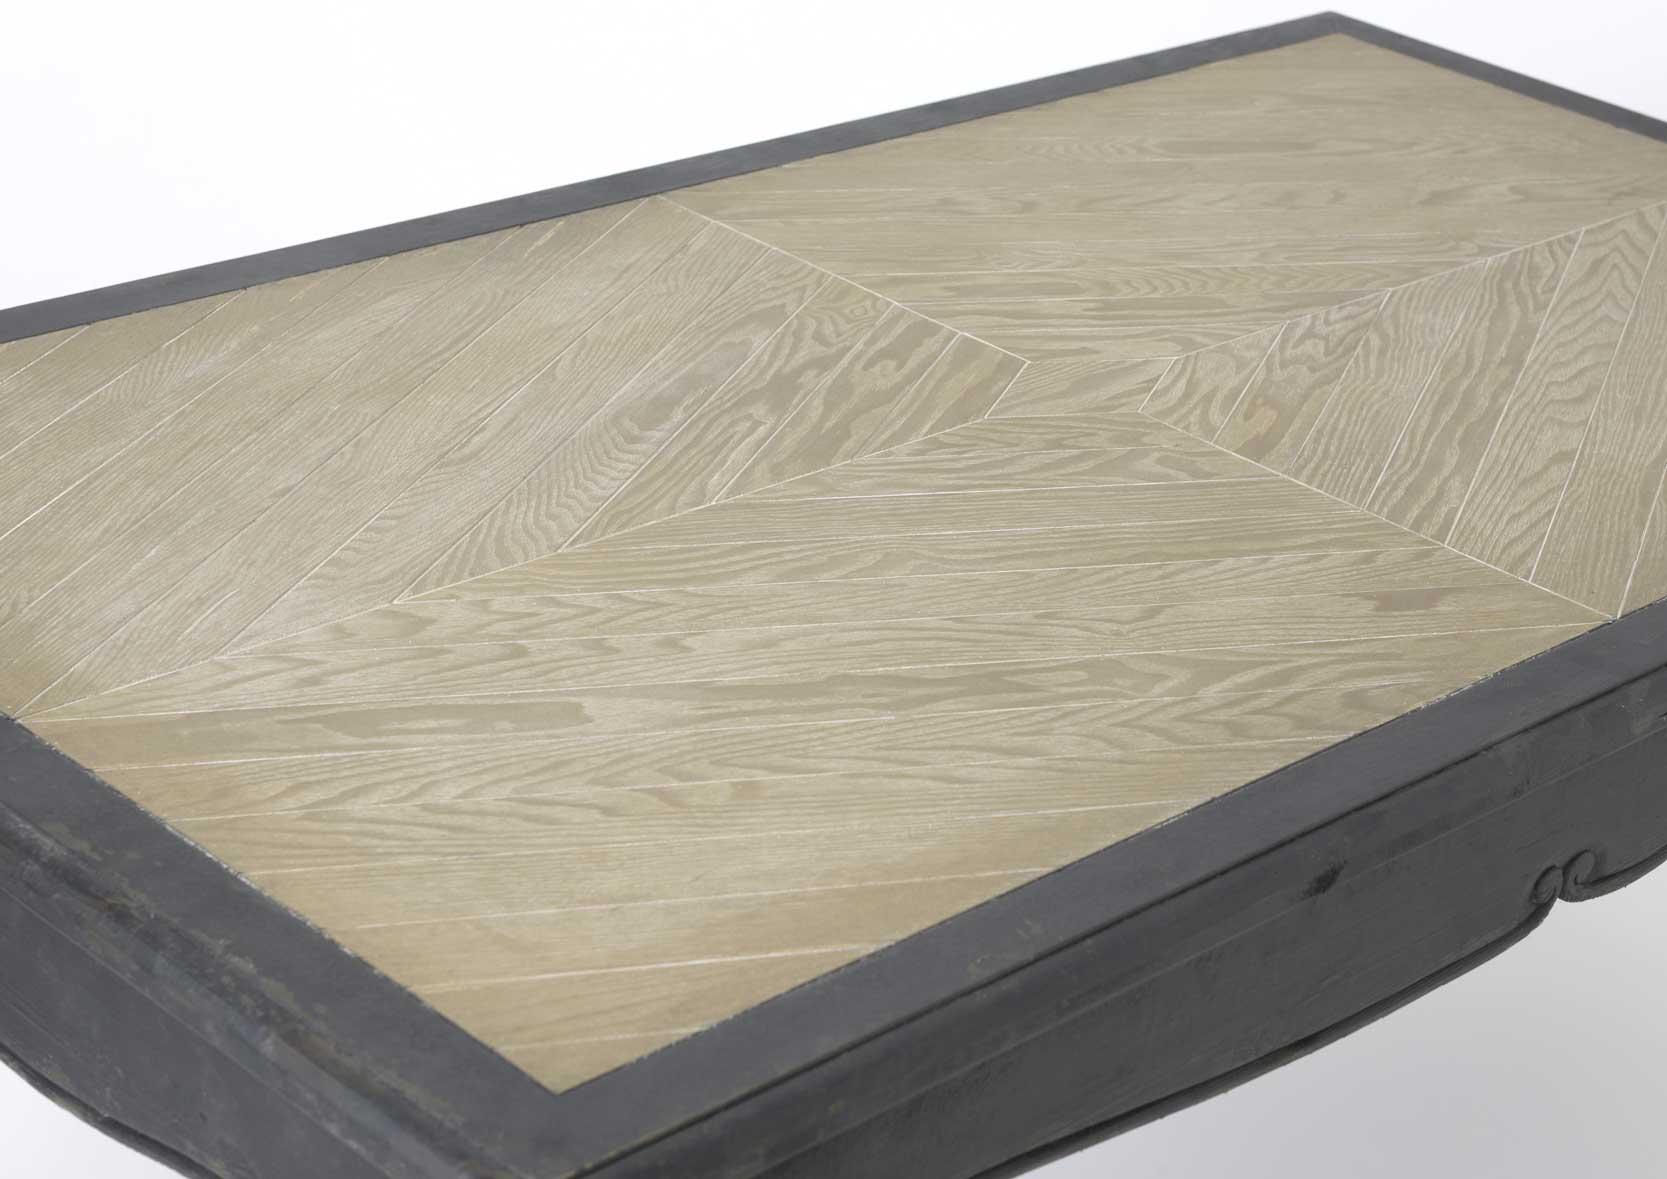 table basse plateau bois. Black Bedroom Furniture Sets. Home Design Ideas